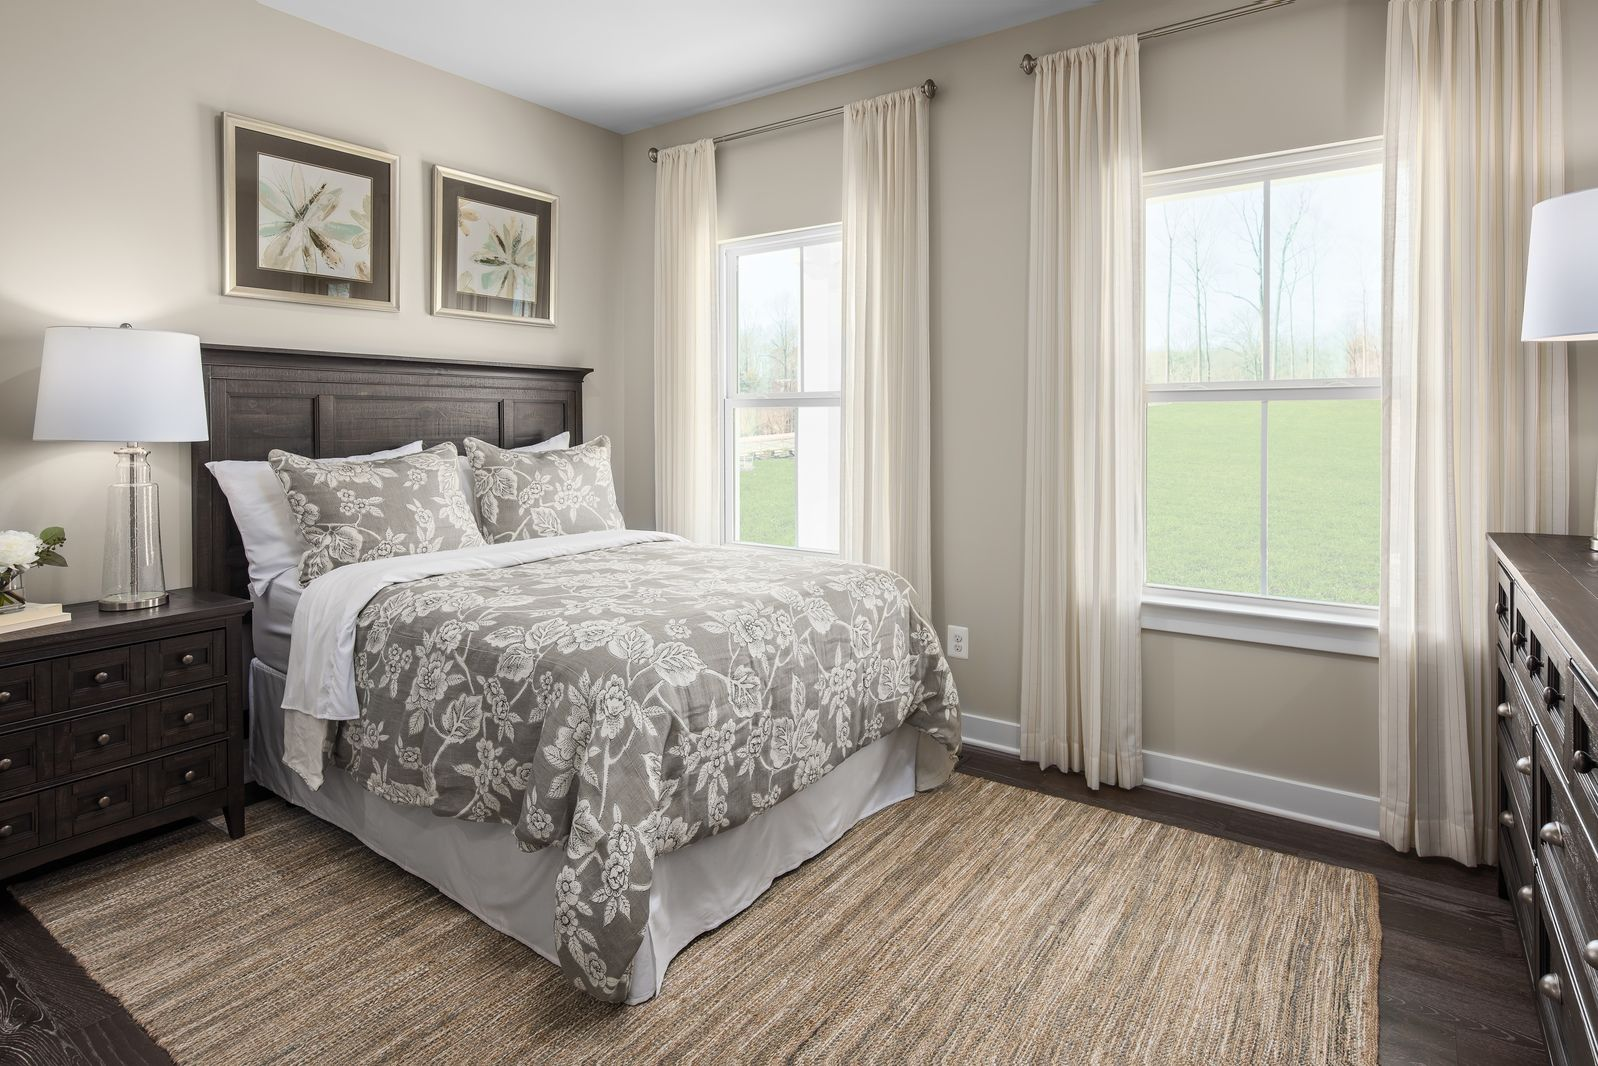 Bedroom featured in the Seneca By Ryan Homes in Washington, VA